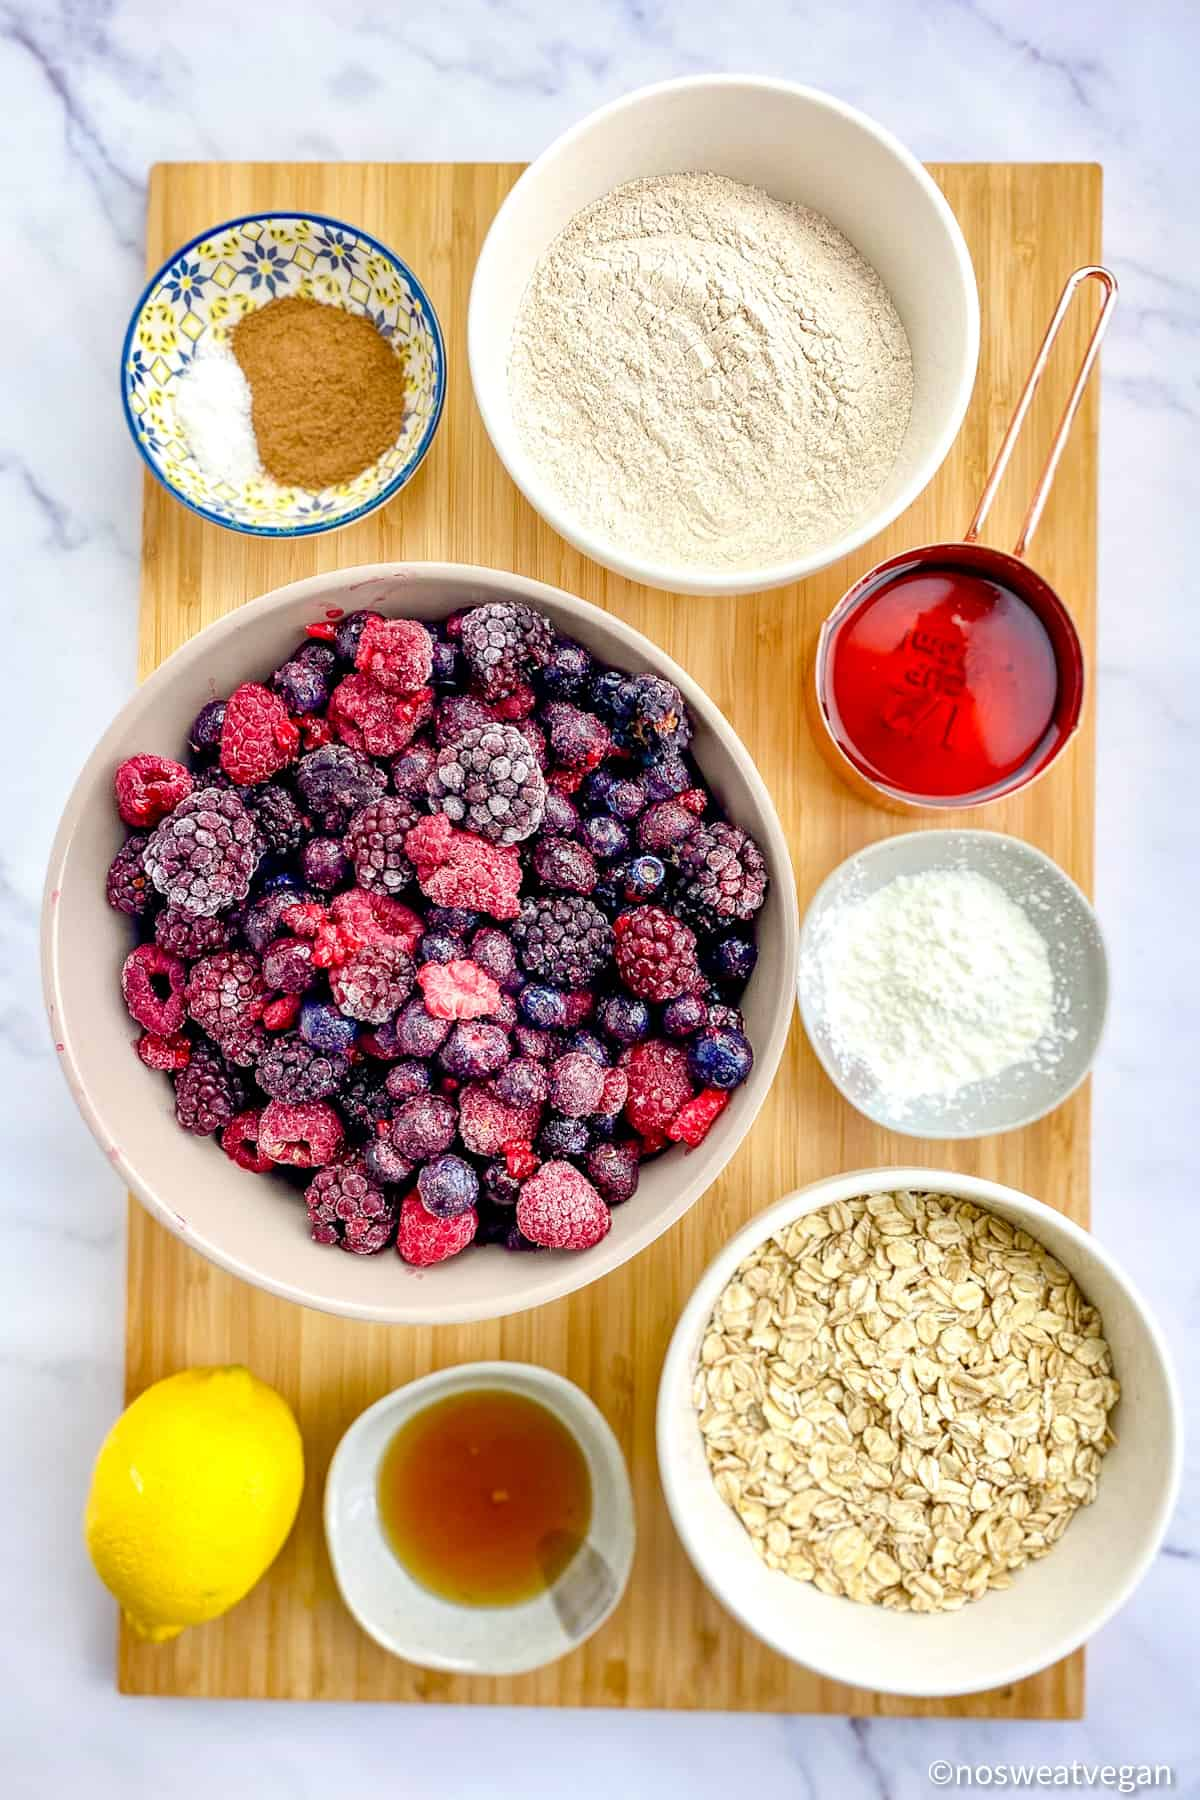 Ingredients for vegan berry crumble.